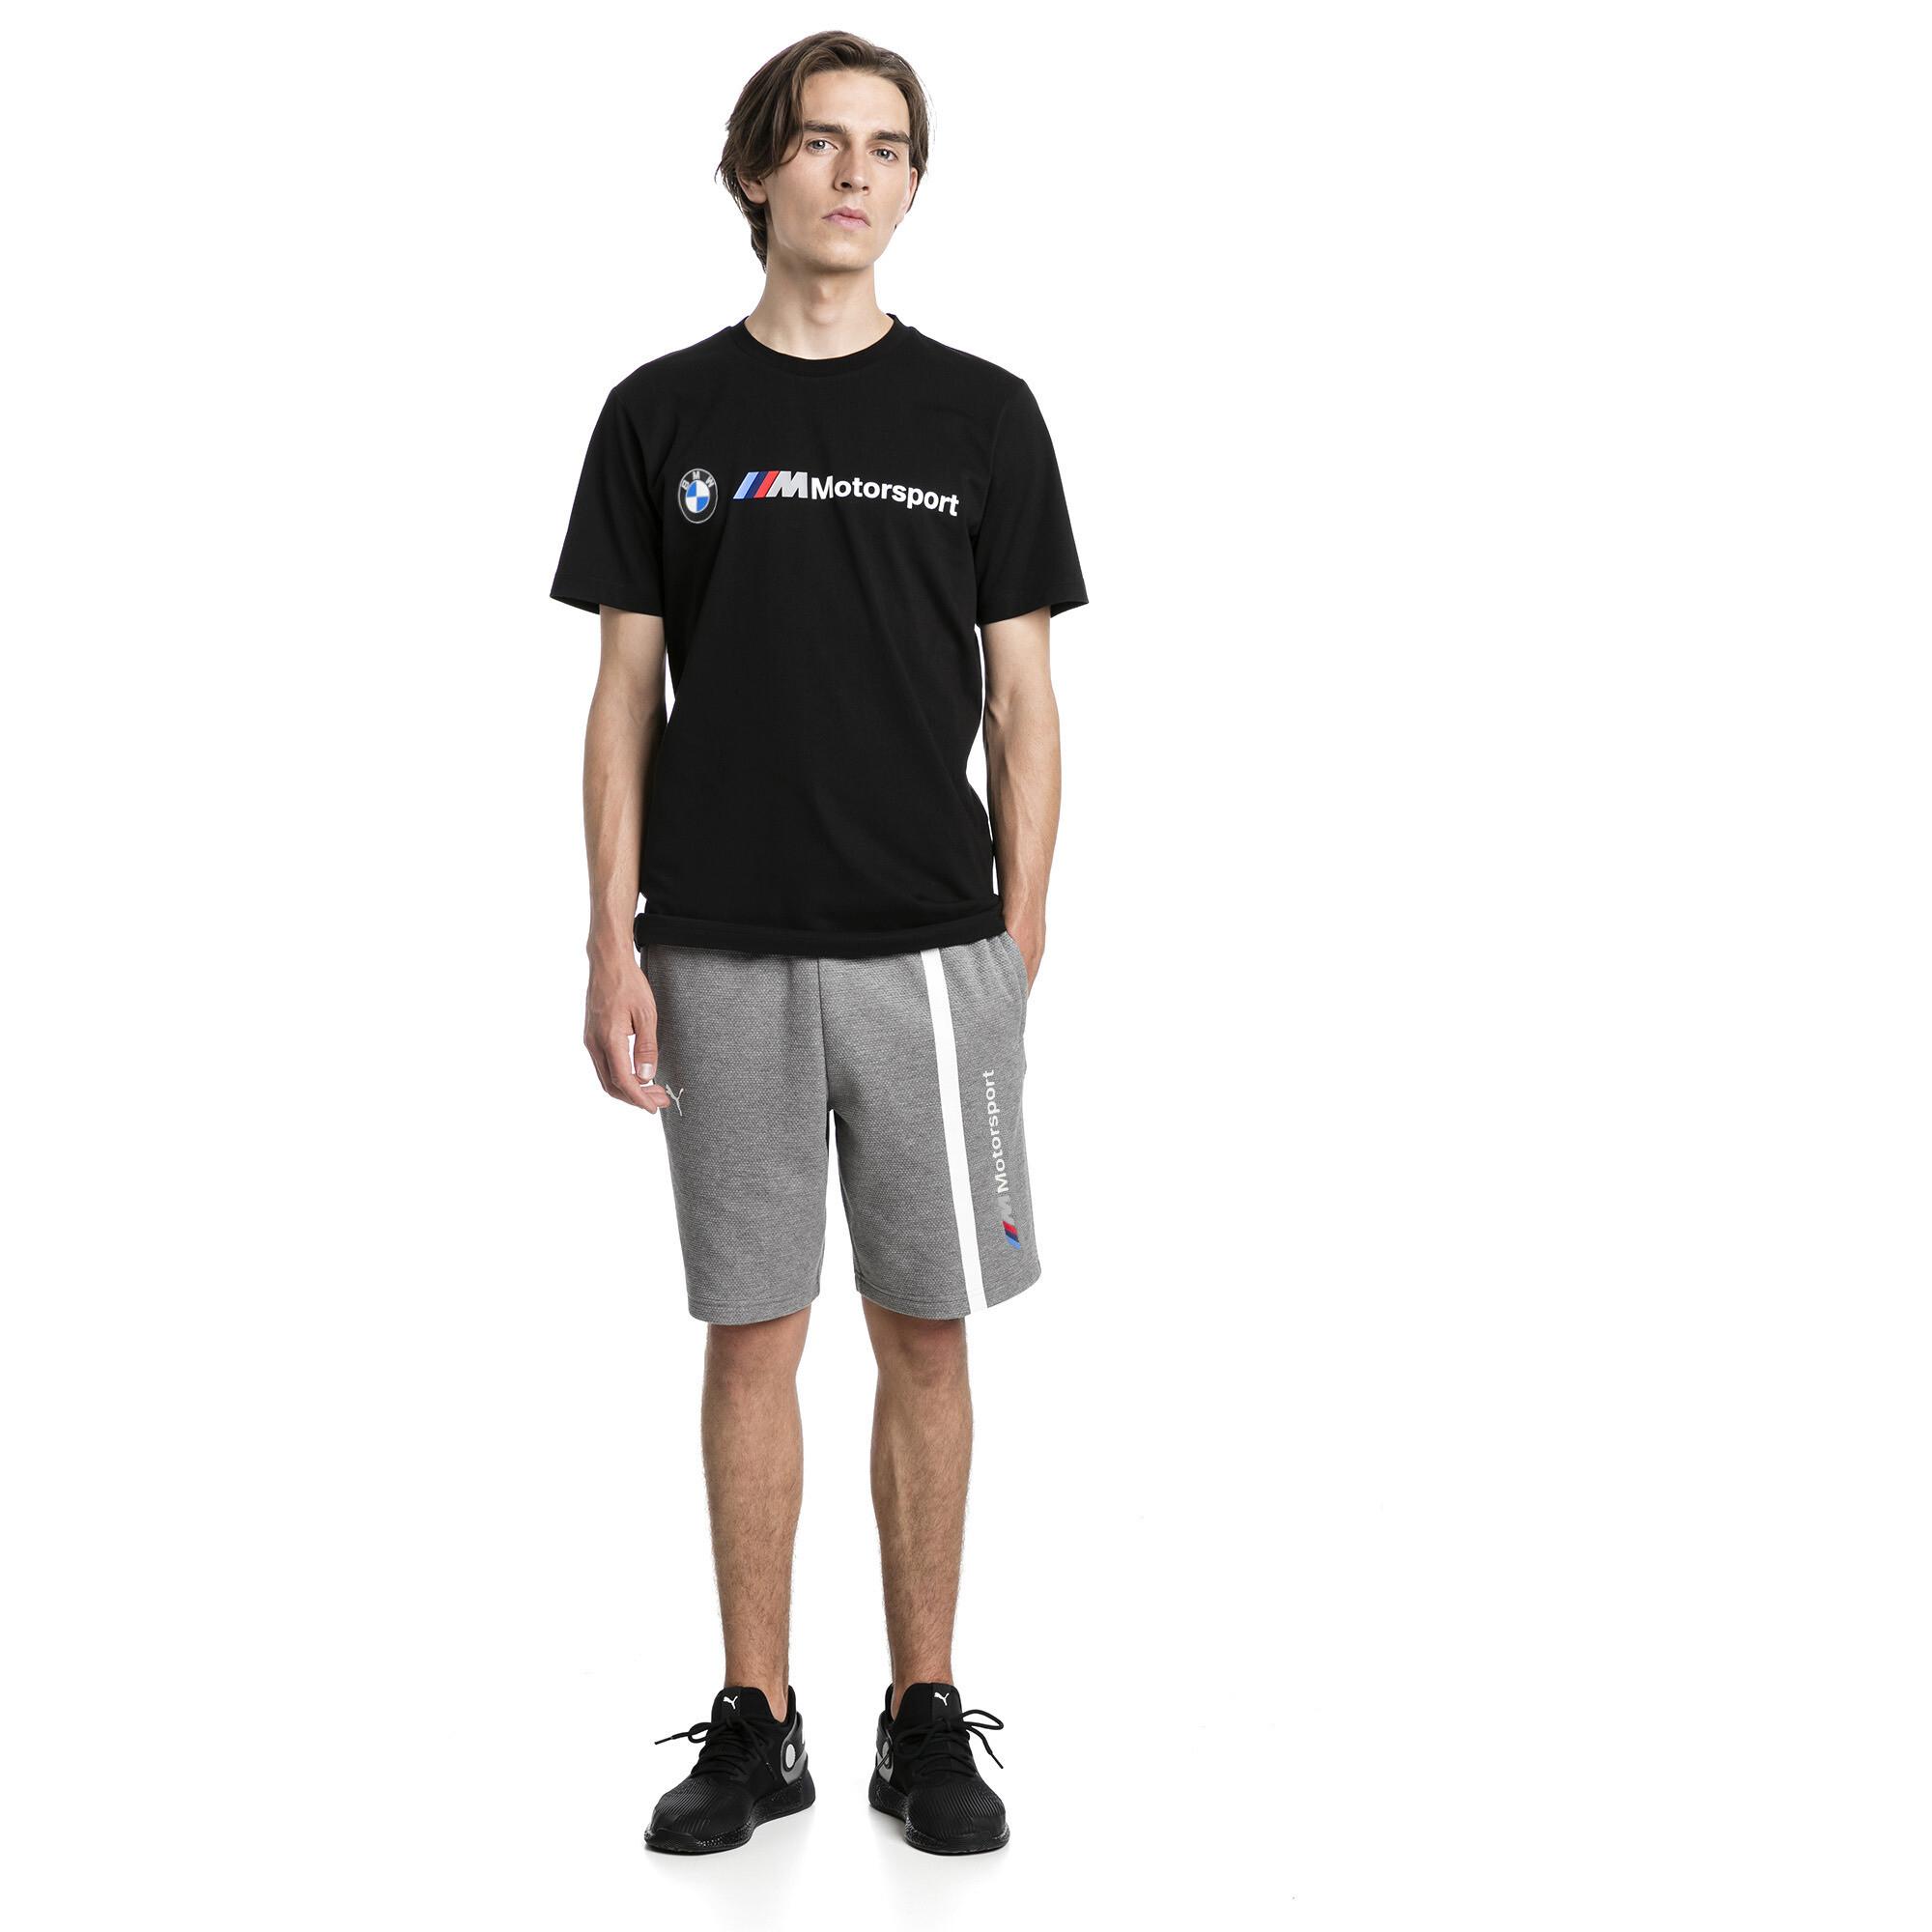 PUMA-BMW-M-Motorsport-Logo-Herren-T-Shirt-Maenner-T-Shirt-Neu Indexbild 6